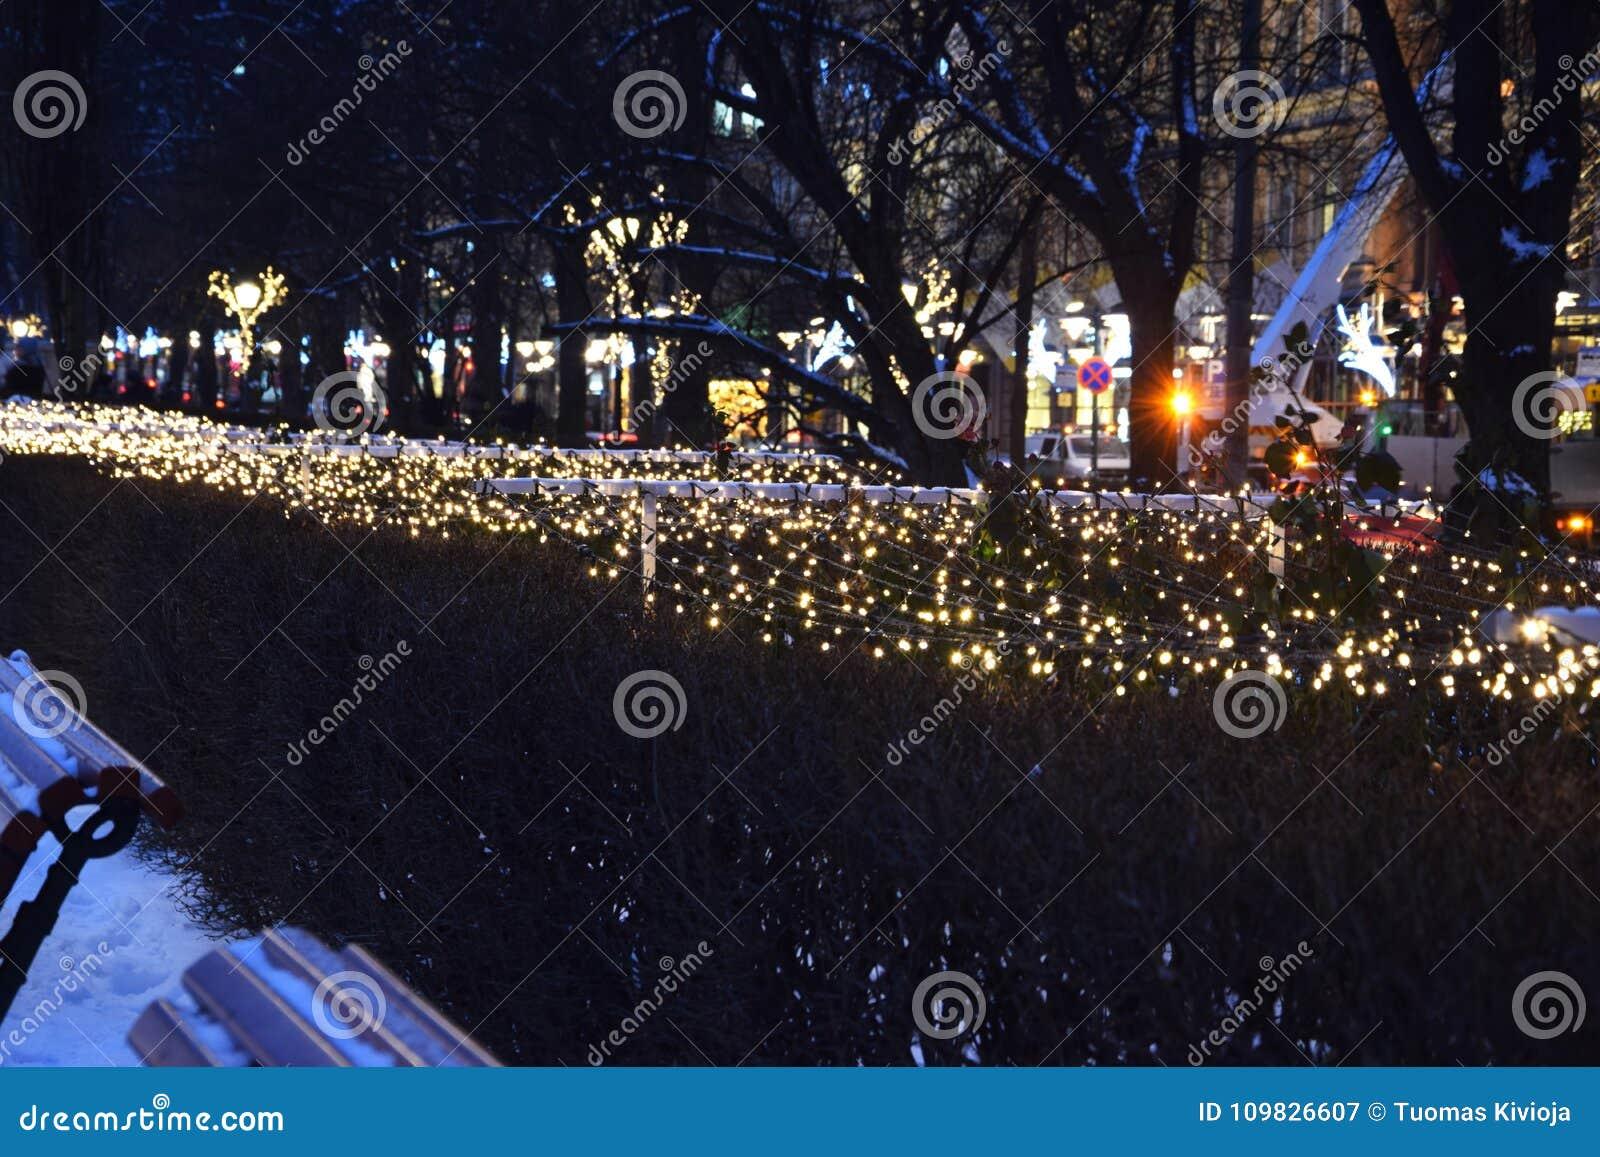 Christmas Bush Lights.Christmas Lights On A Bush In Helsinki Finland Stock Image